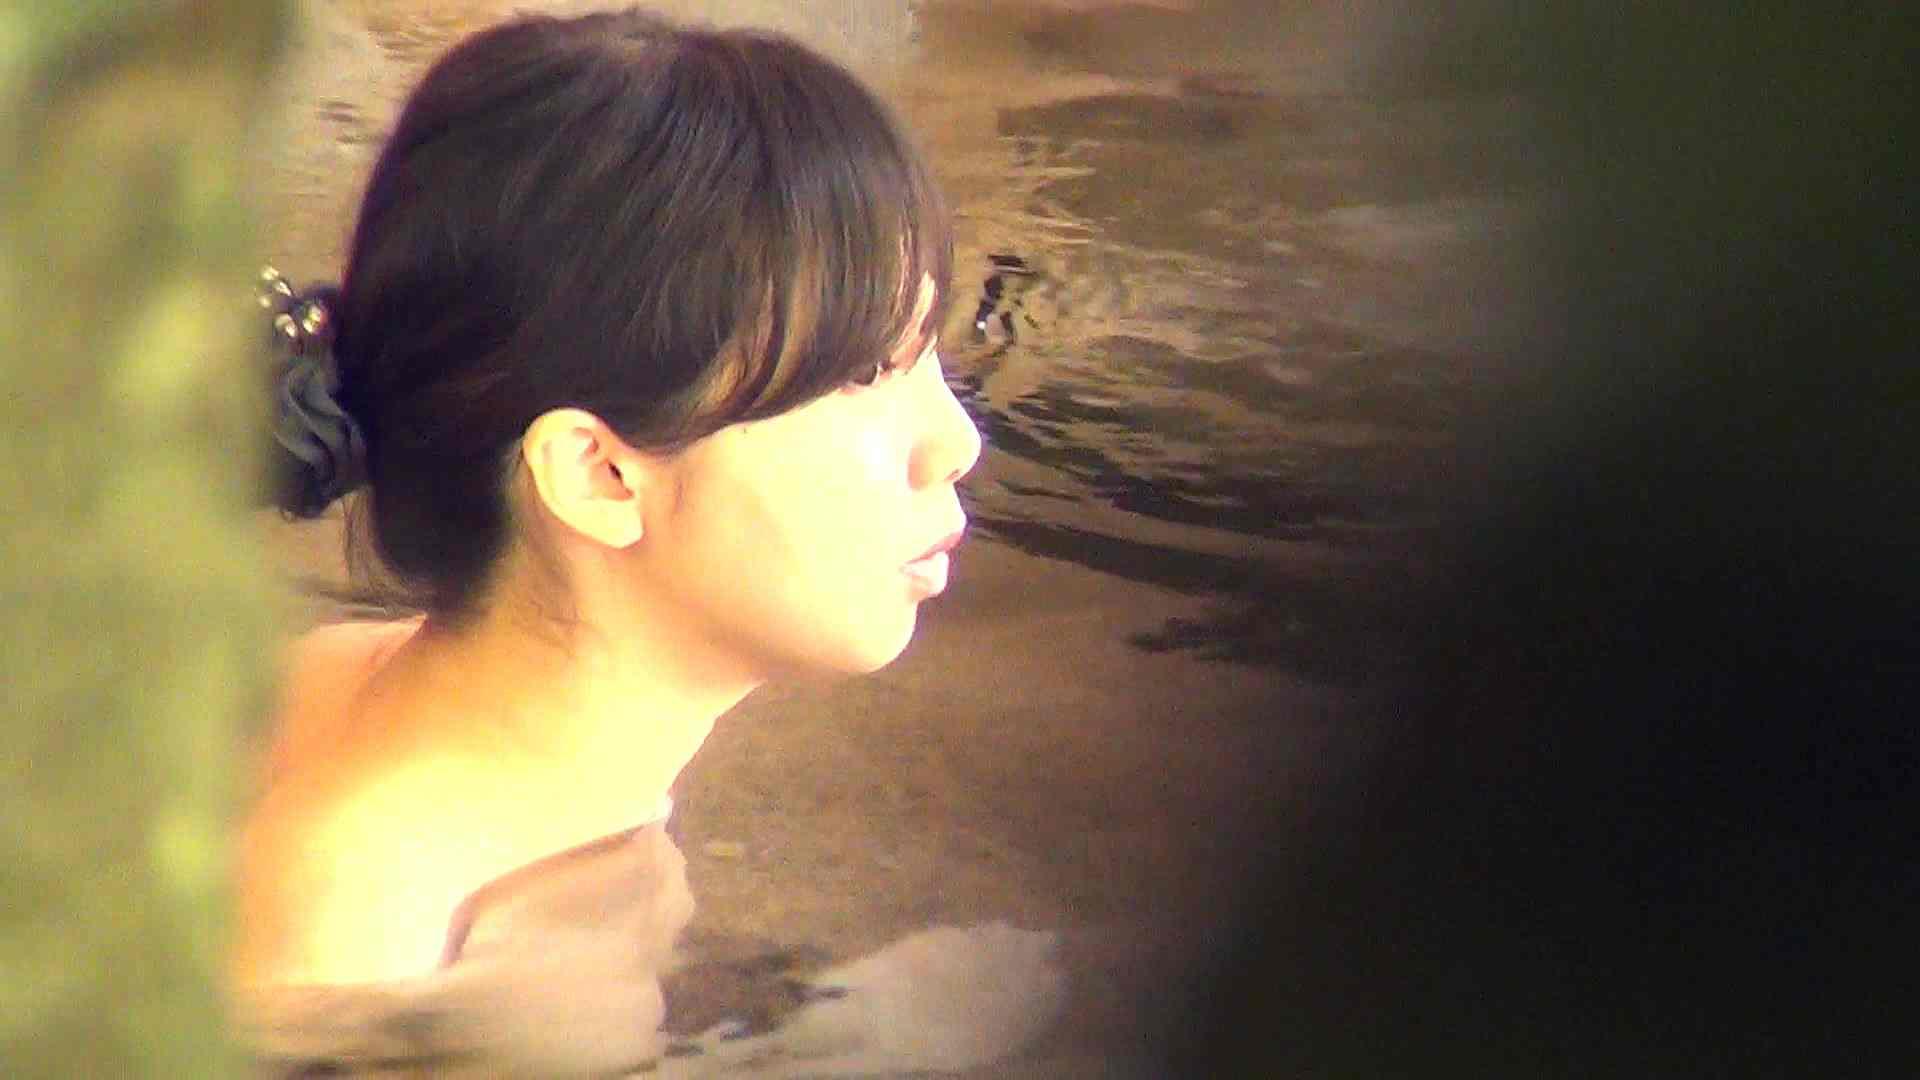 Aquaな露天風呂Vol.285 盗撮  97連発 12